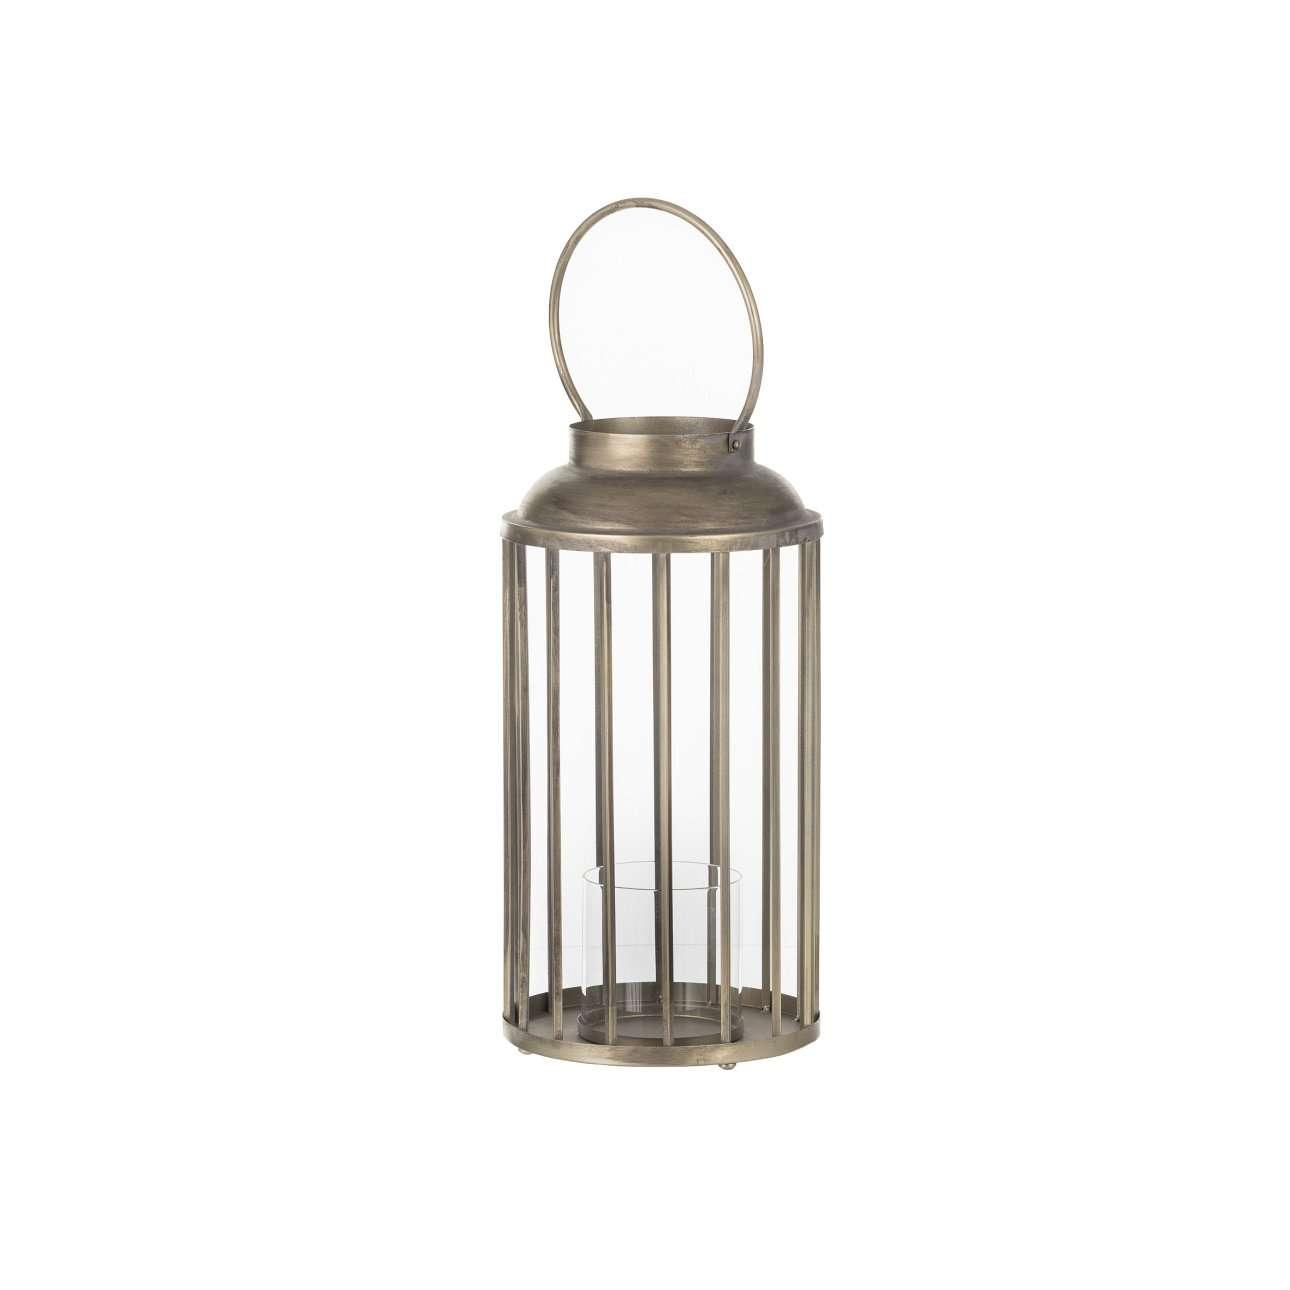 Lantaarn Ø24x47 cm BRADES antiek brons Light & Living